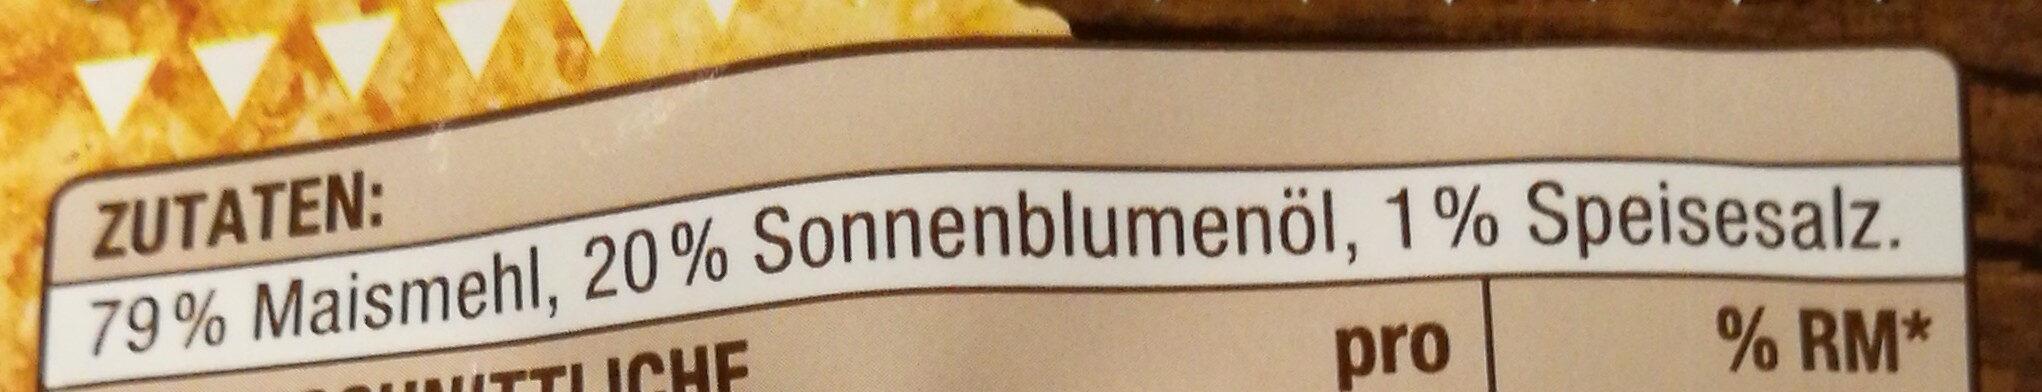 Tortilla Chips gesalzen - Ingredienti - de